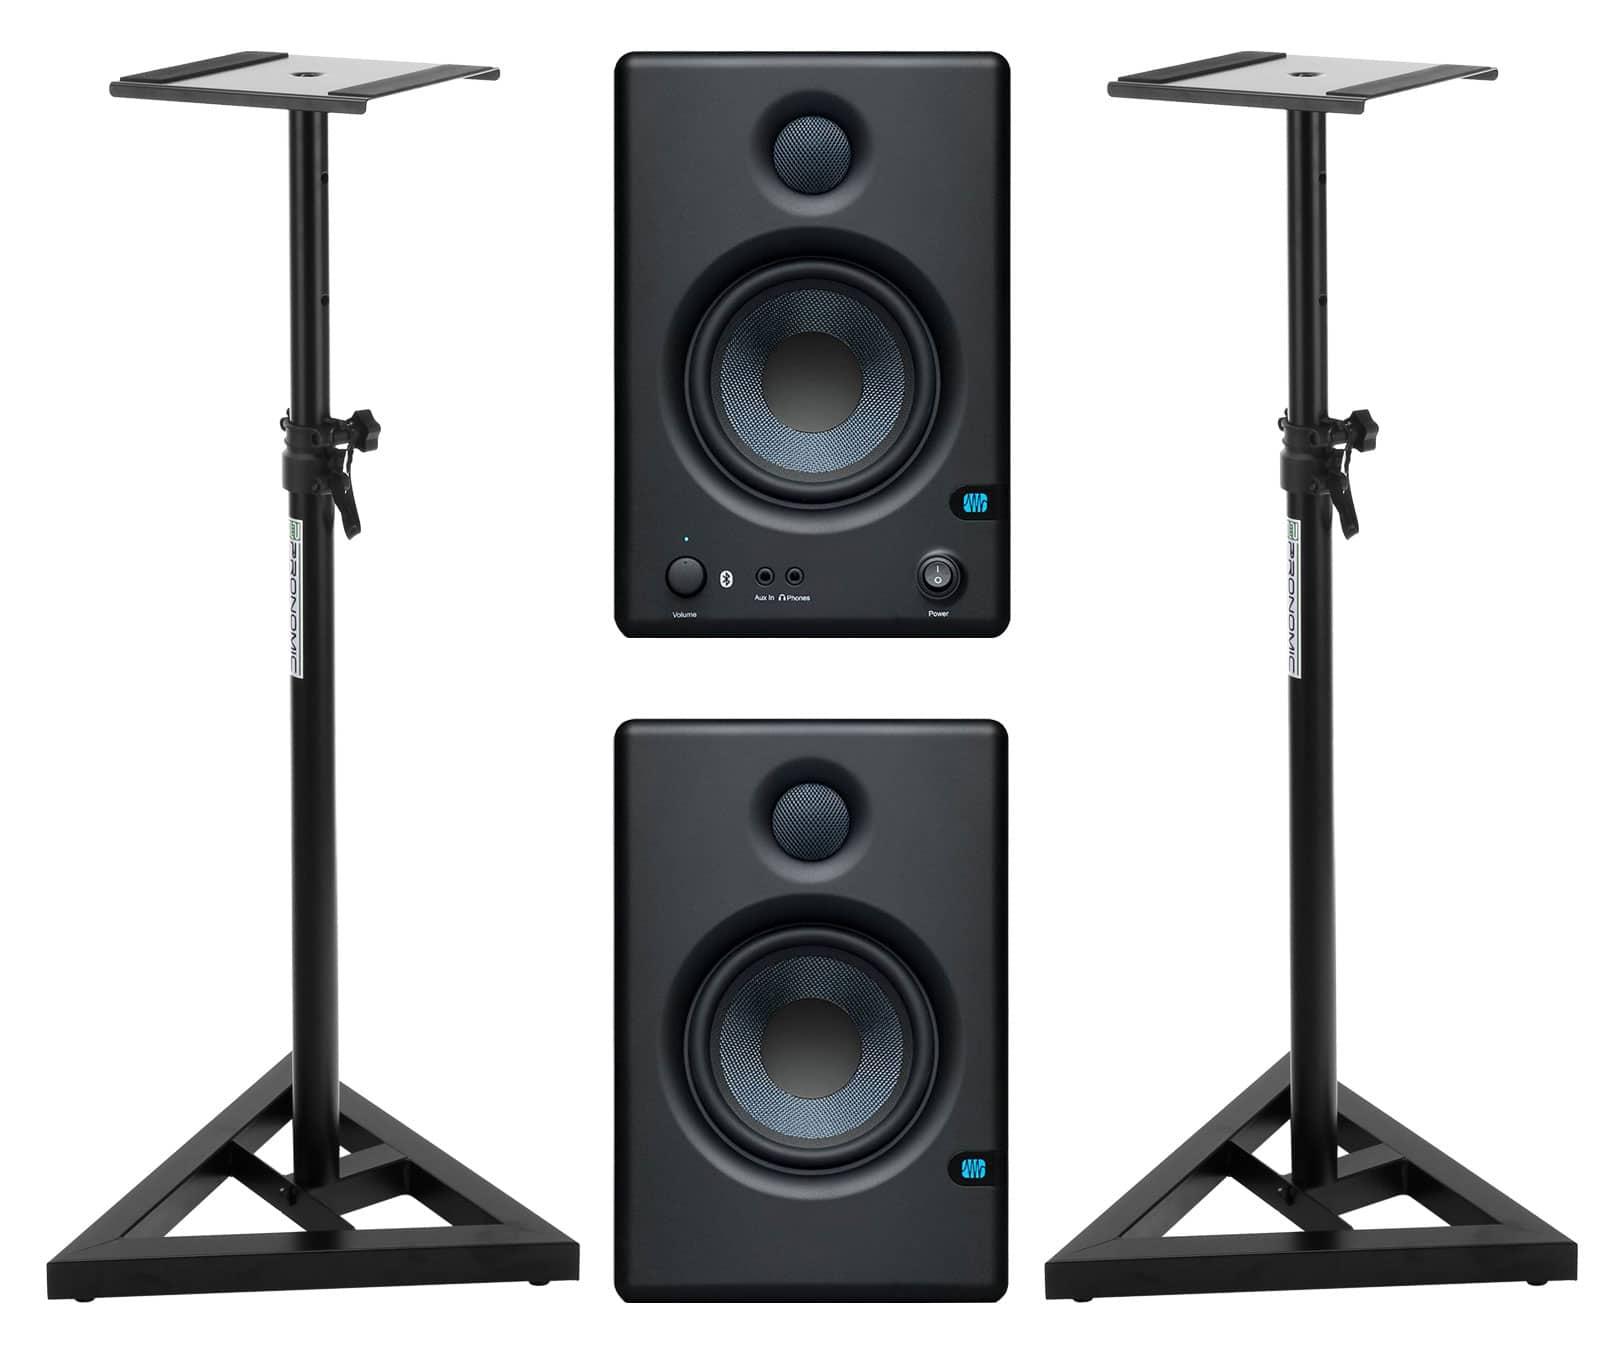 Studiomonitore - PreSonus Eris E4.5 BT Aktives Studiomonitor Set inkl. Boxenstativen - Onlineshop Musikhaus Kirstein